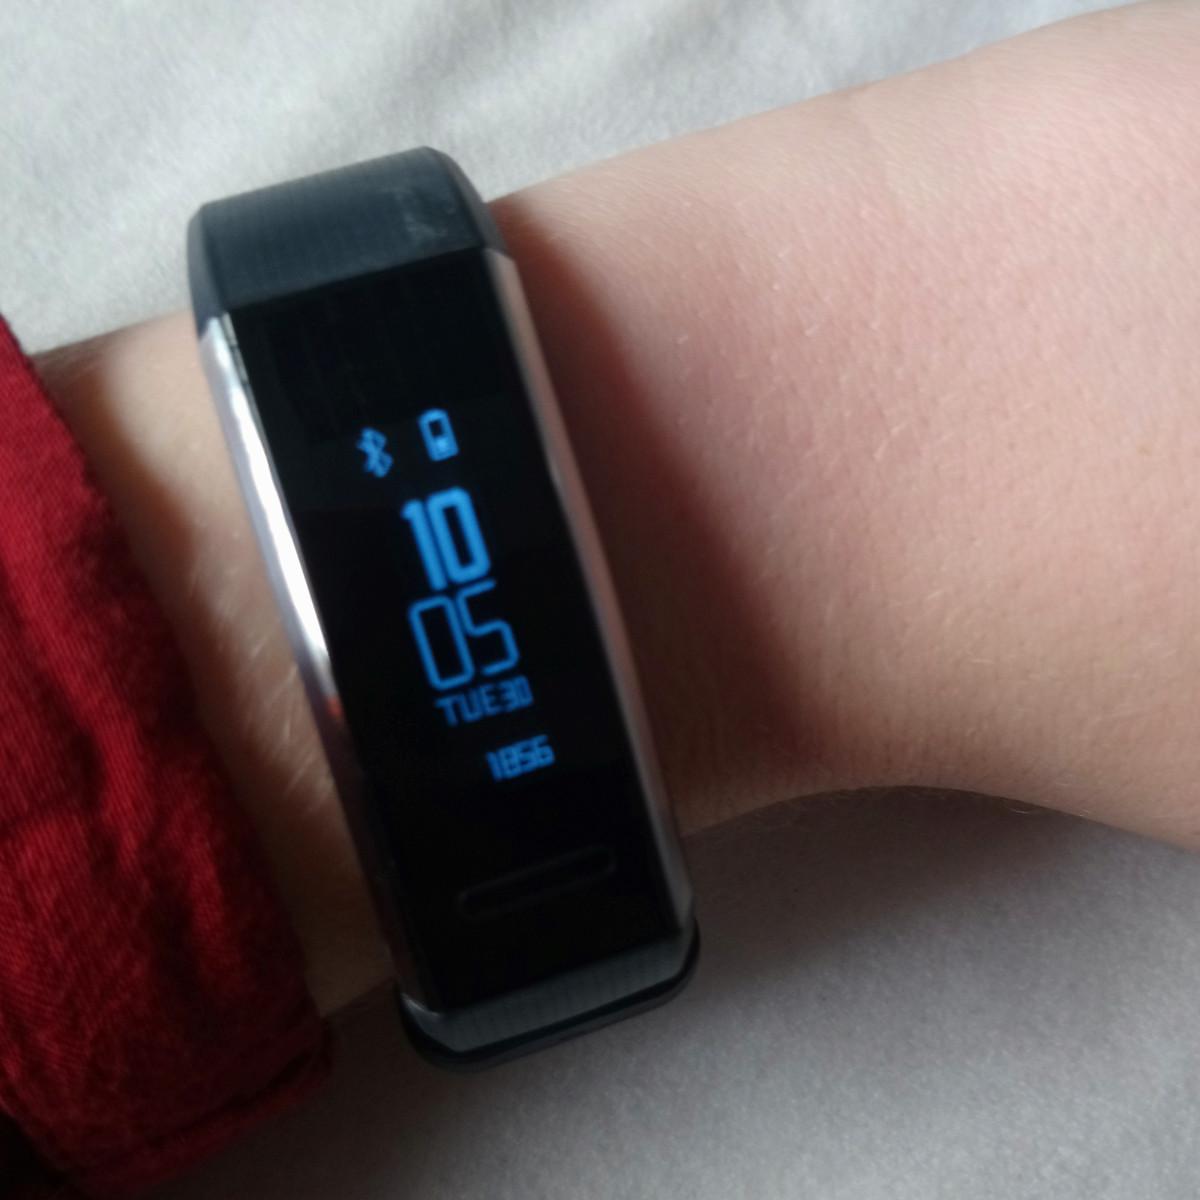 Huawei Band 2 Pro Startbildschirm (Image by Jennifer Eilitz)